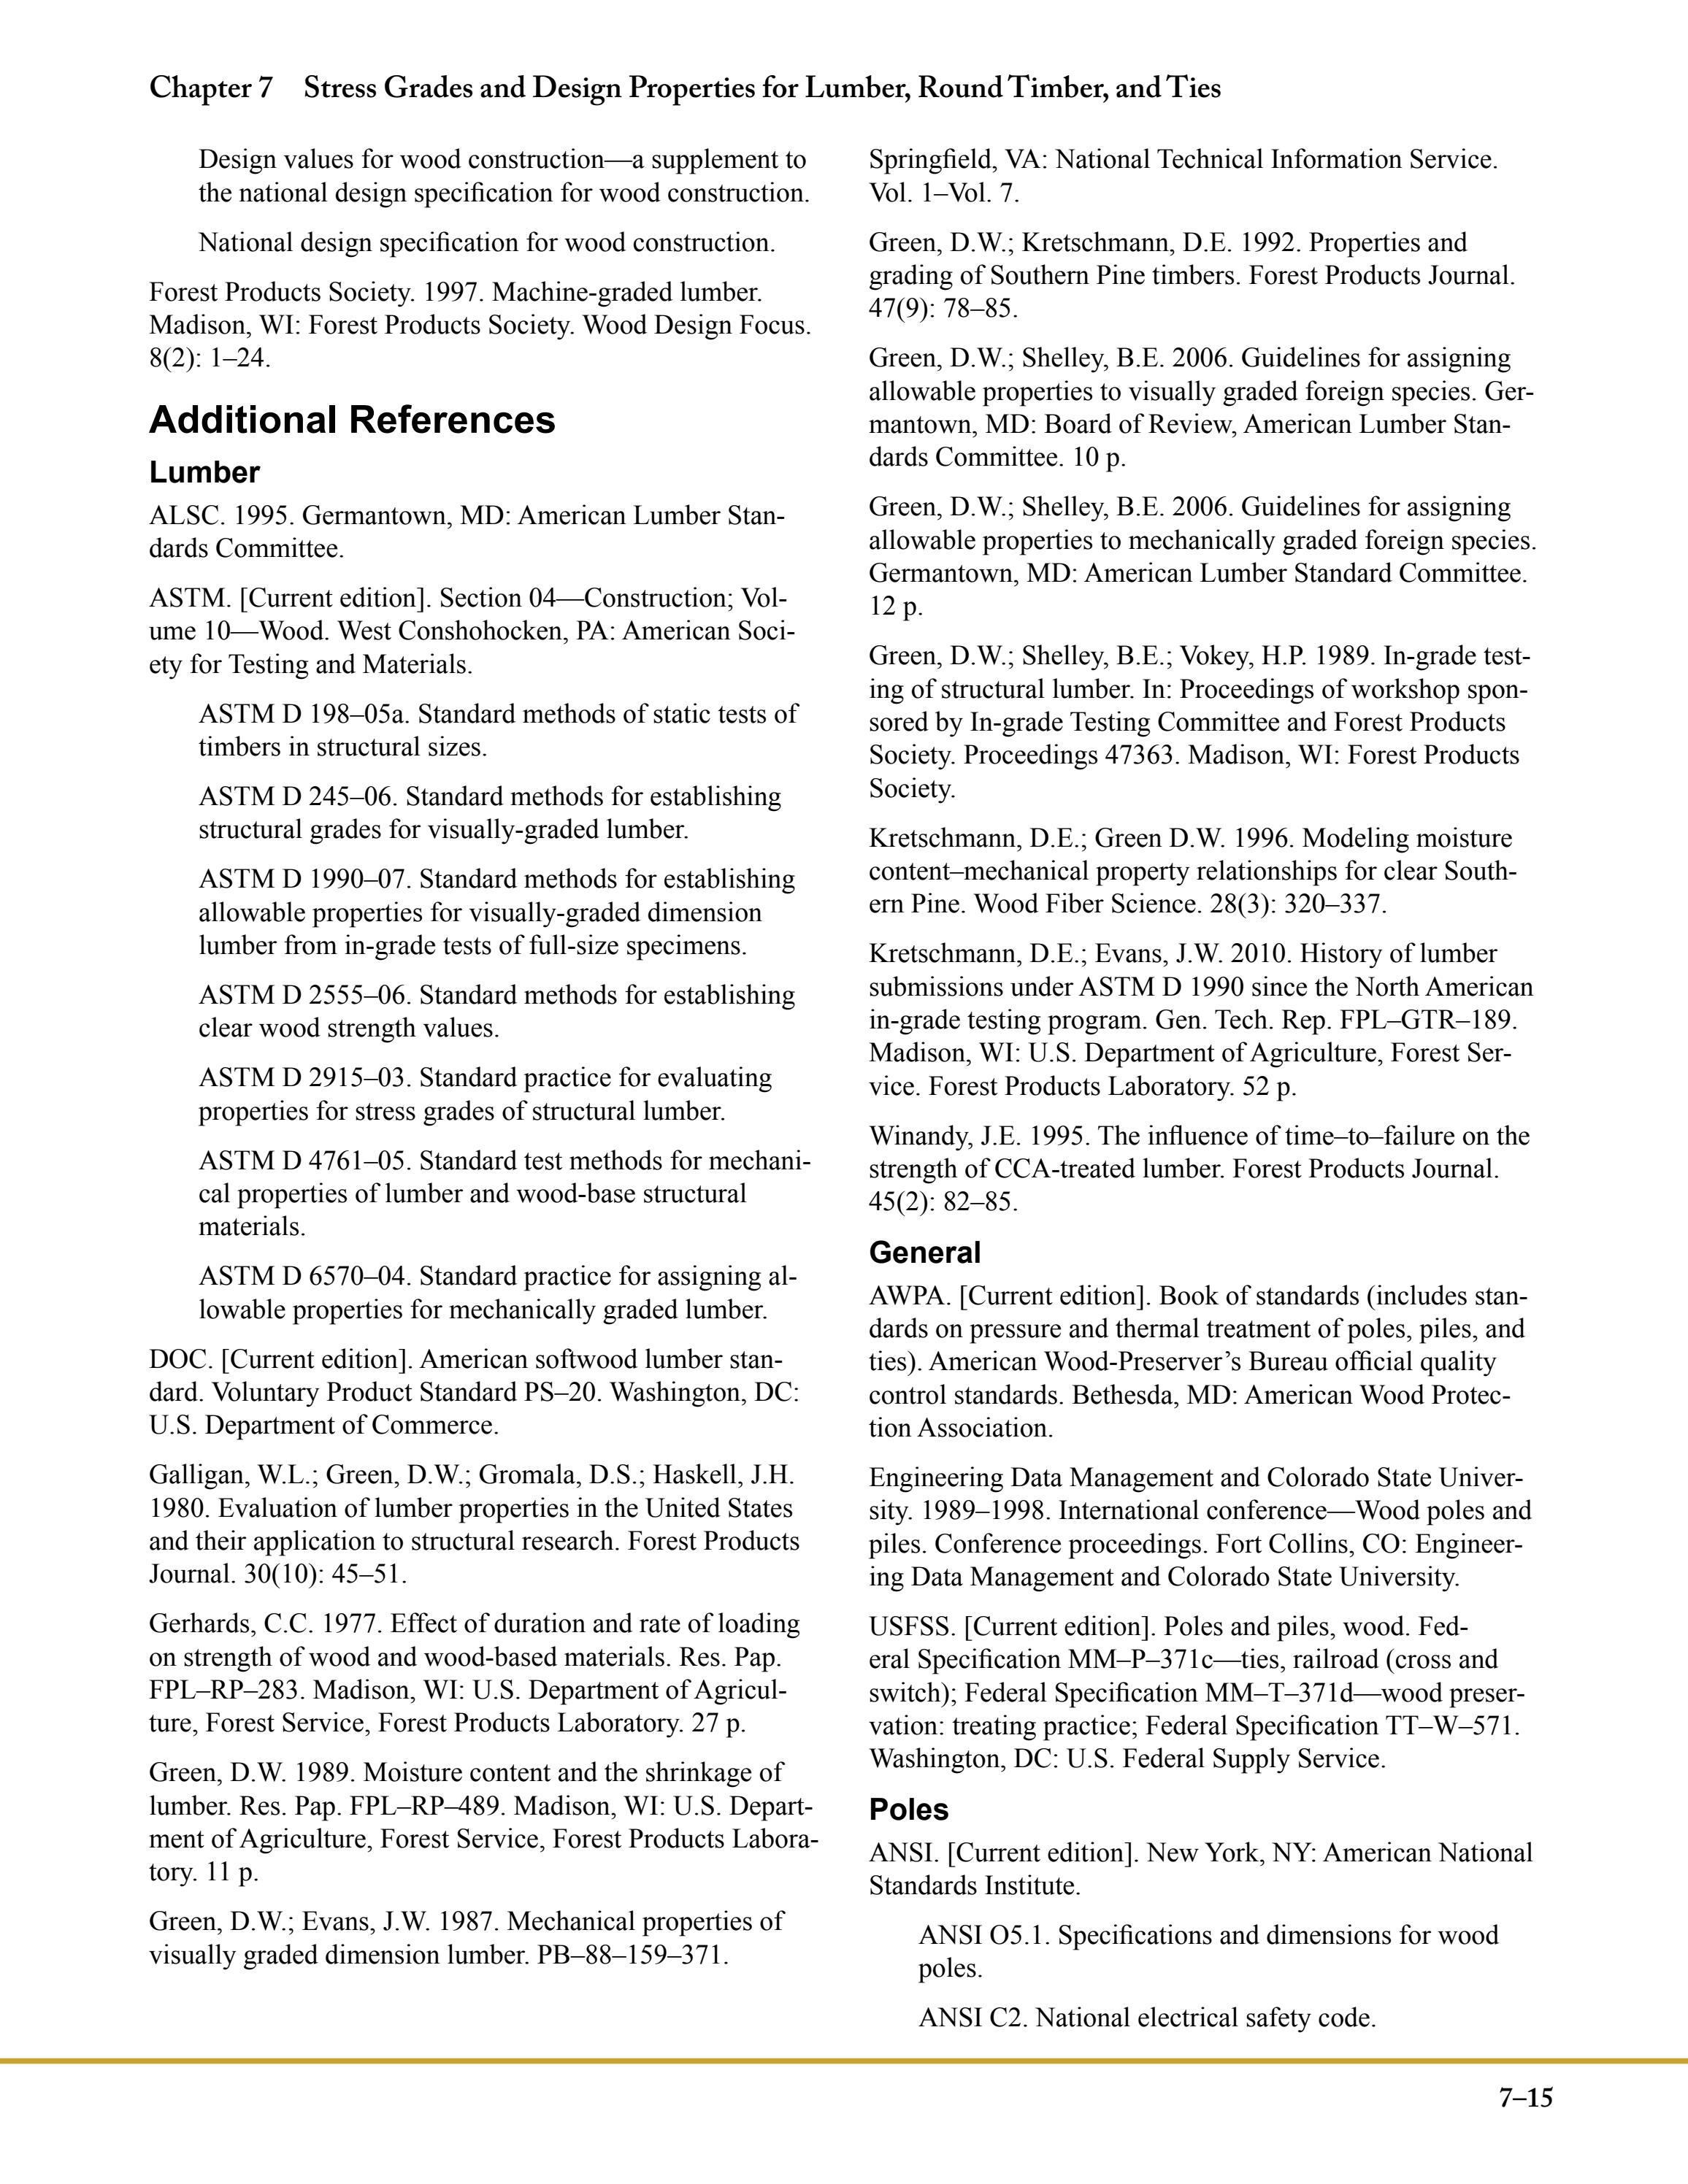 Wood Handbook: Centennial Edition by National Hardwood